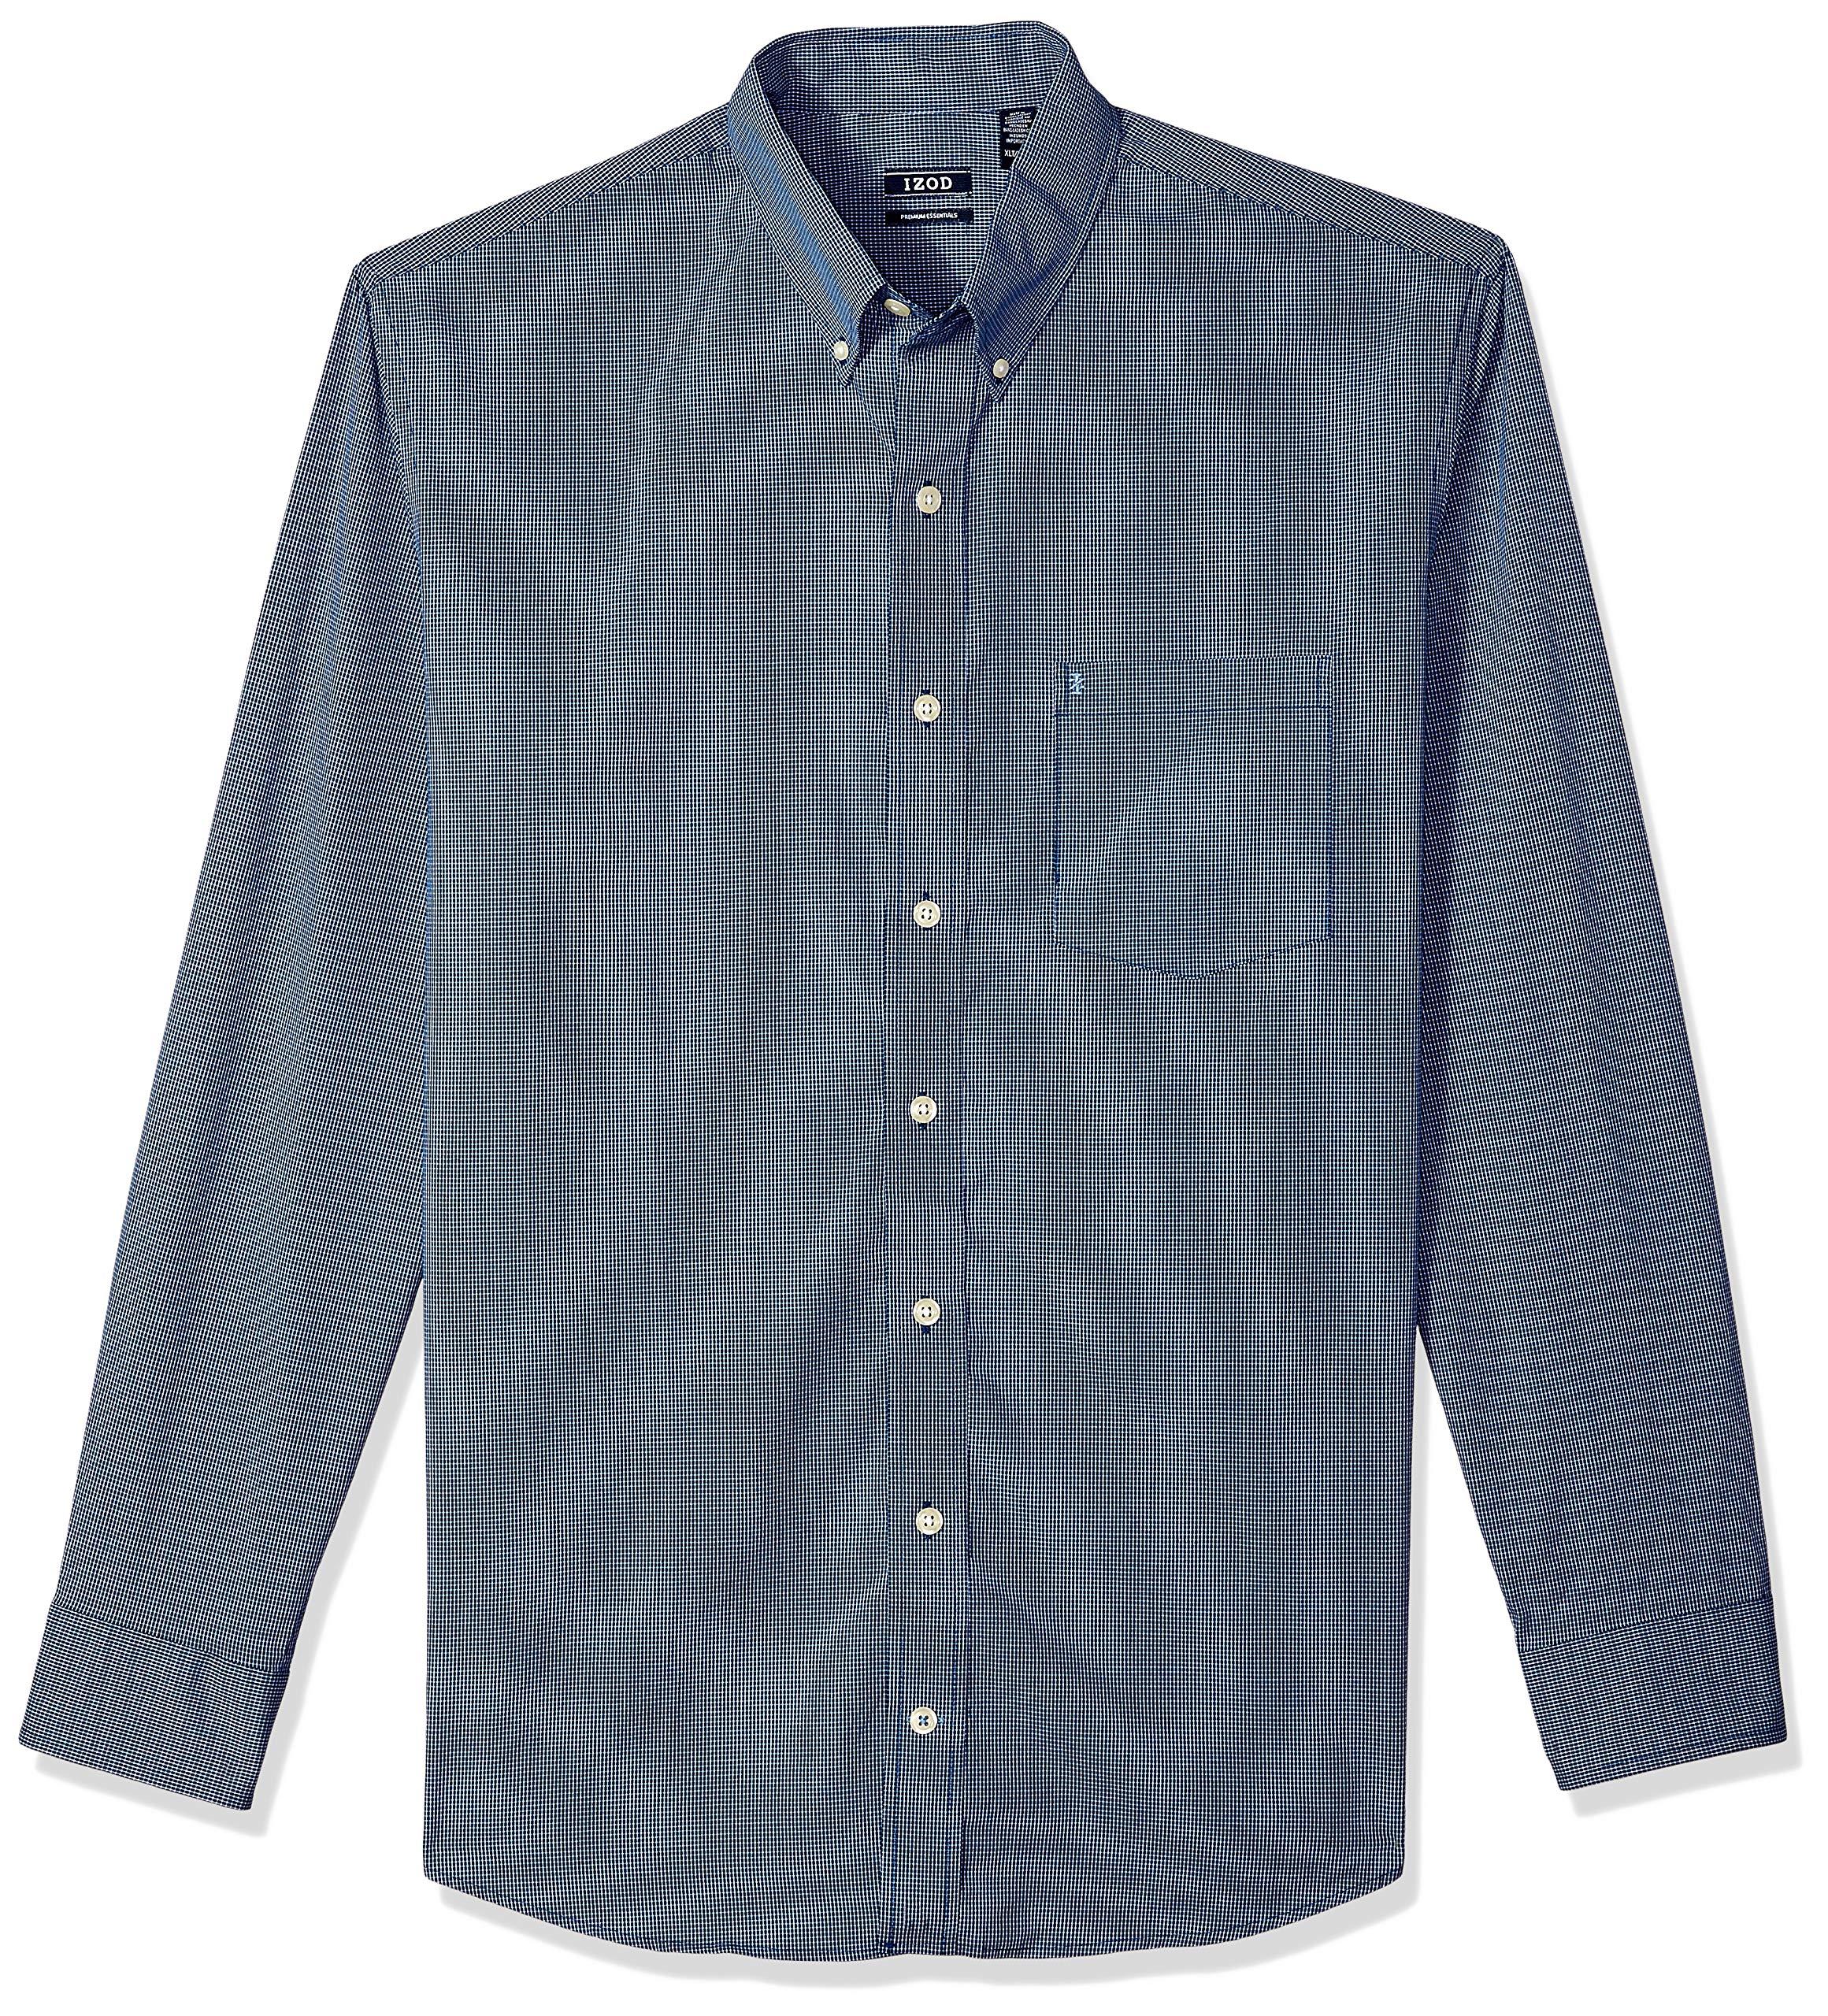 Izod Mens Big and Tall Button Down Long Sleeve Stretch Performance Stripe Shirt Button Down Shirt